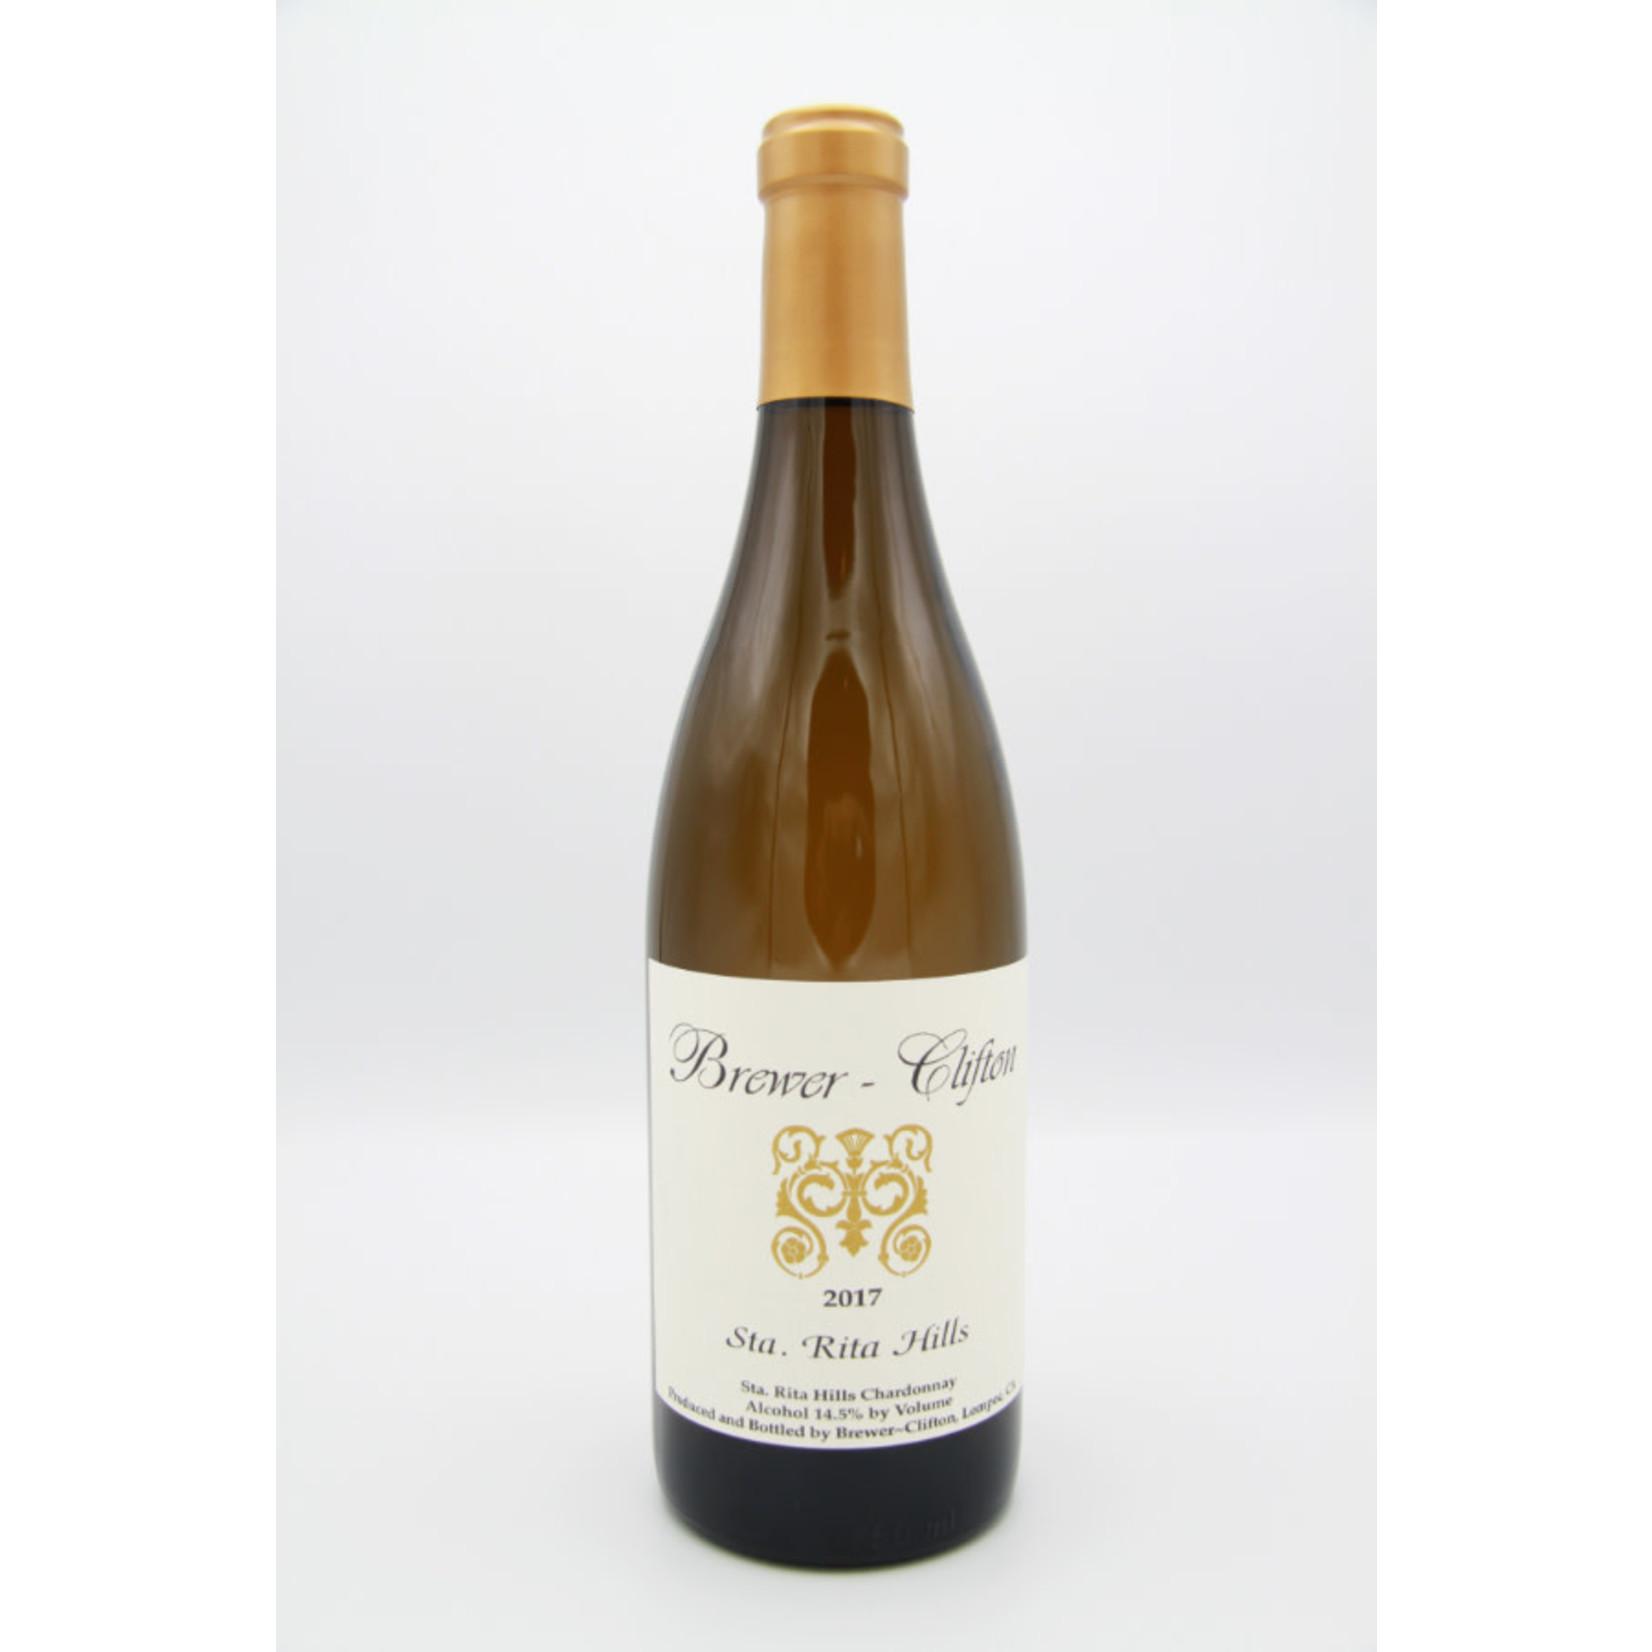 2017 Brewer Clifton Sta. Rita Hills Chardonnay